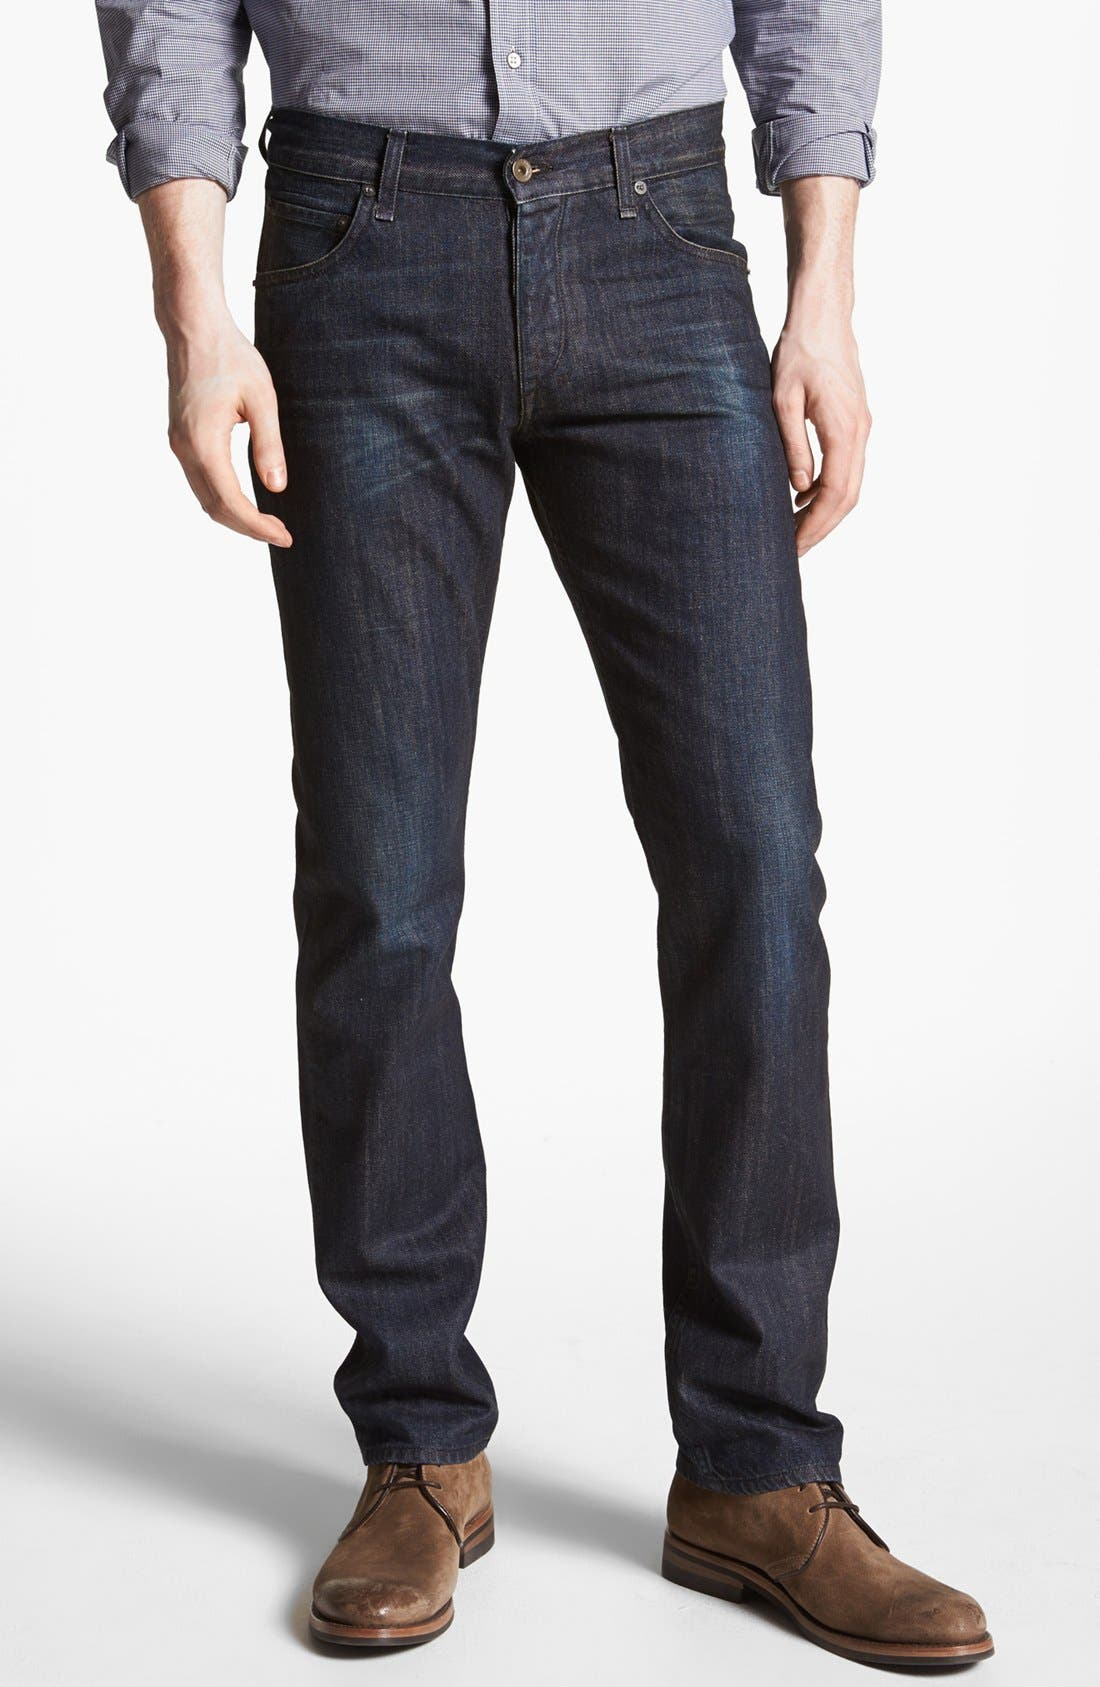 Alternate Image 1 Selected - rag & bone 'RB15X' Slim Straight Leg Jeans (Indigo Flint)